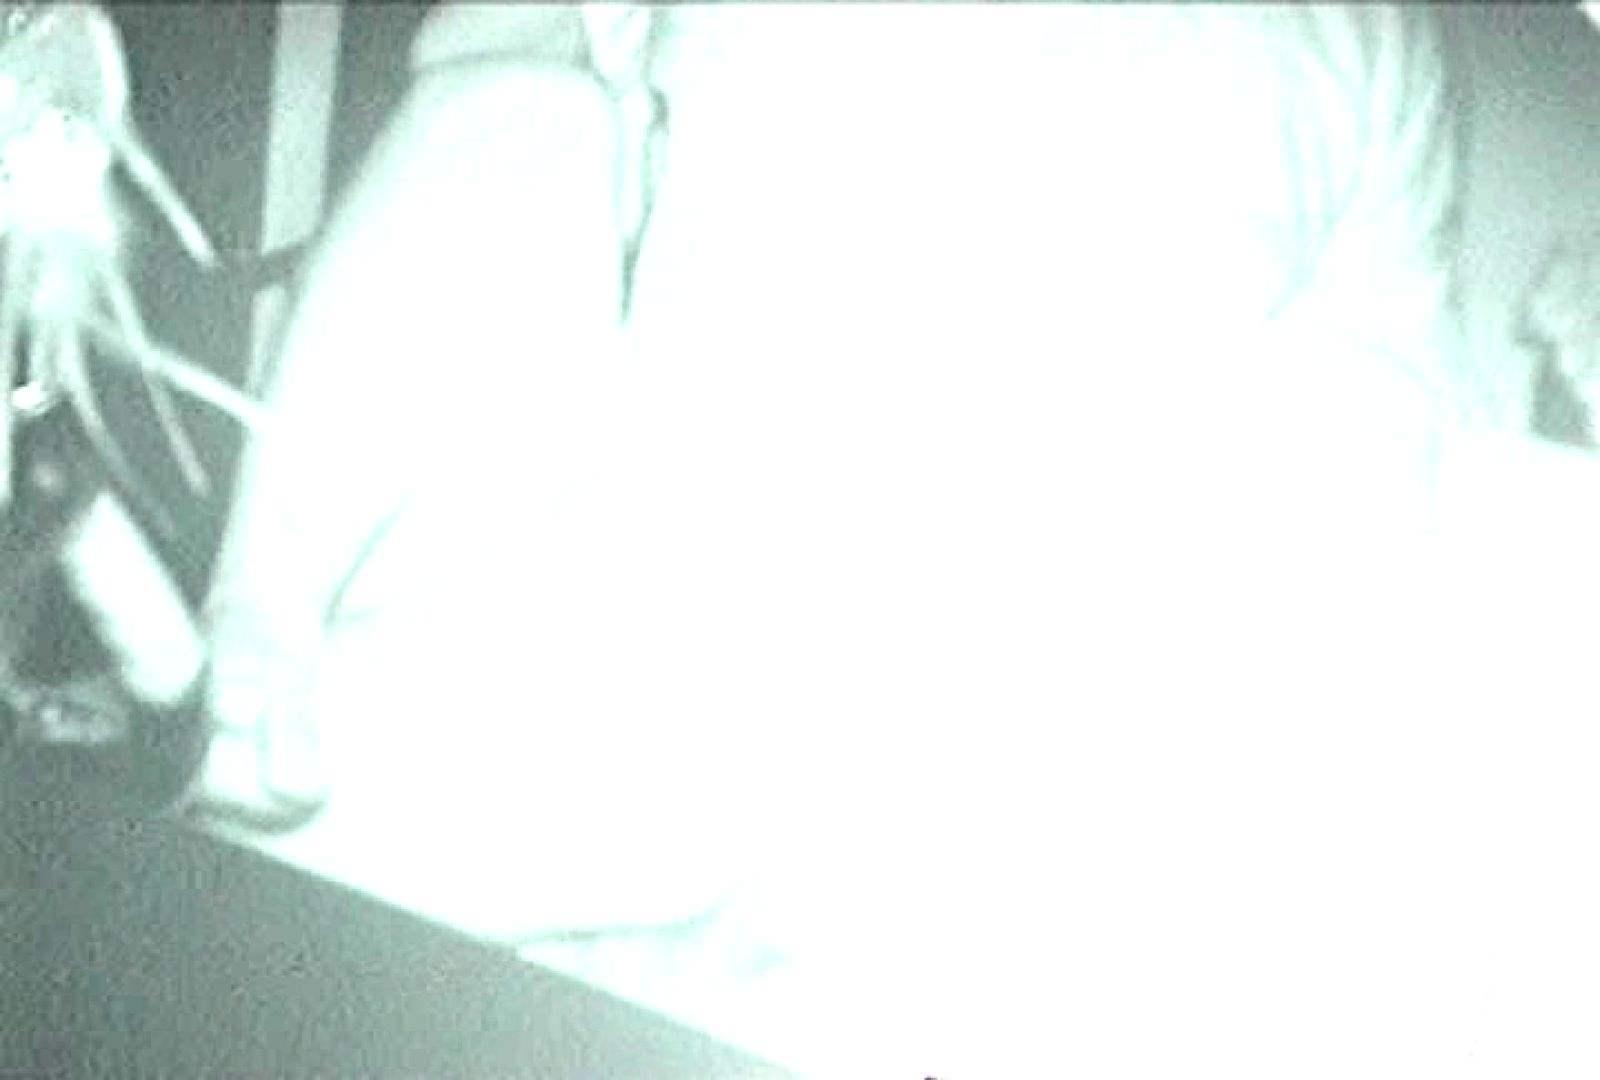 充血監督の深夜の運動会Vol.99 美女OL オメコ無修正動画無料 67連発 6